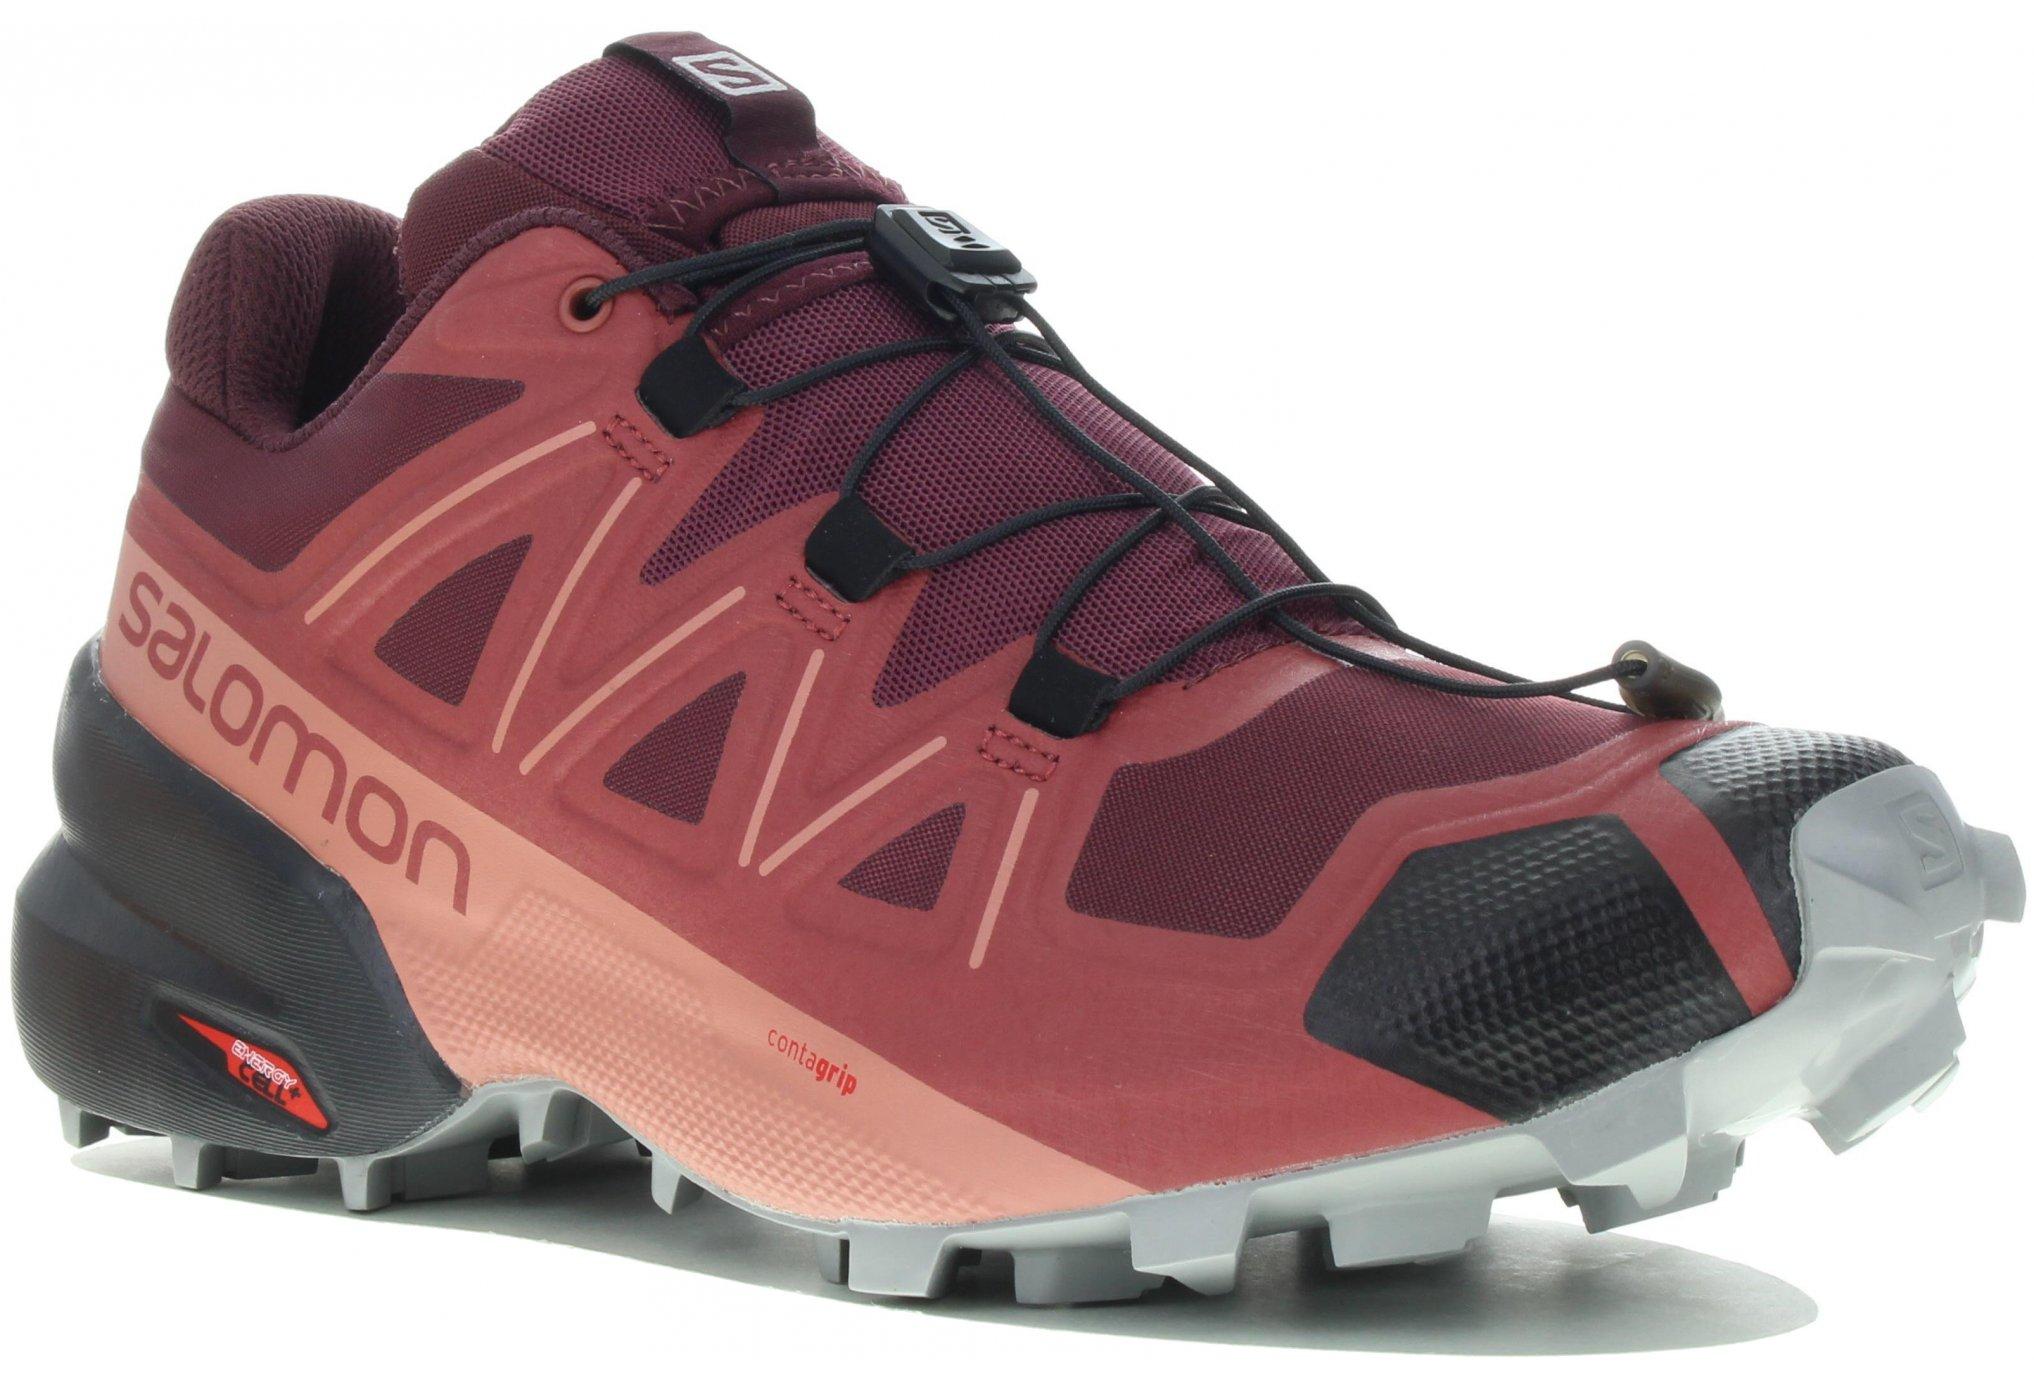 Salomon Speedcross 5 Chaussures running femme